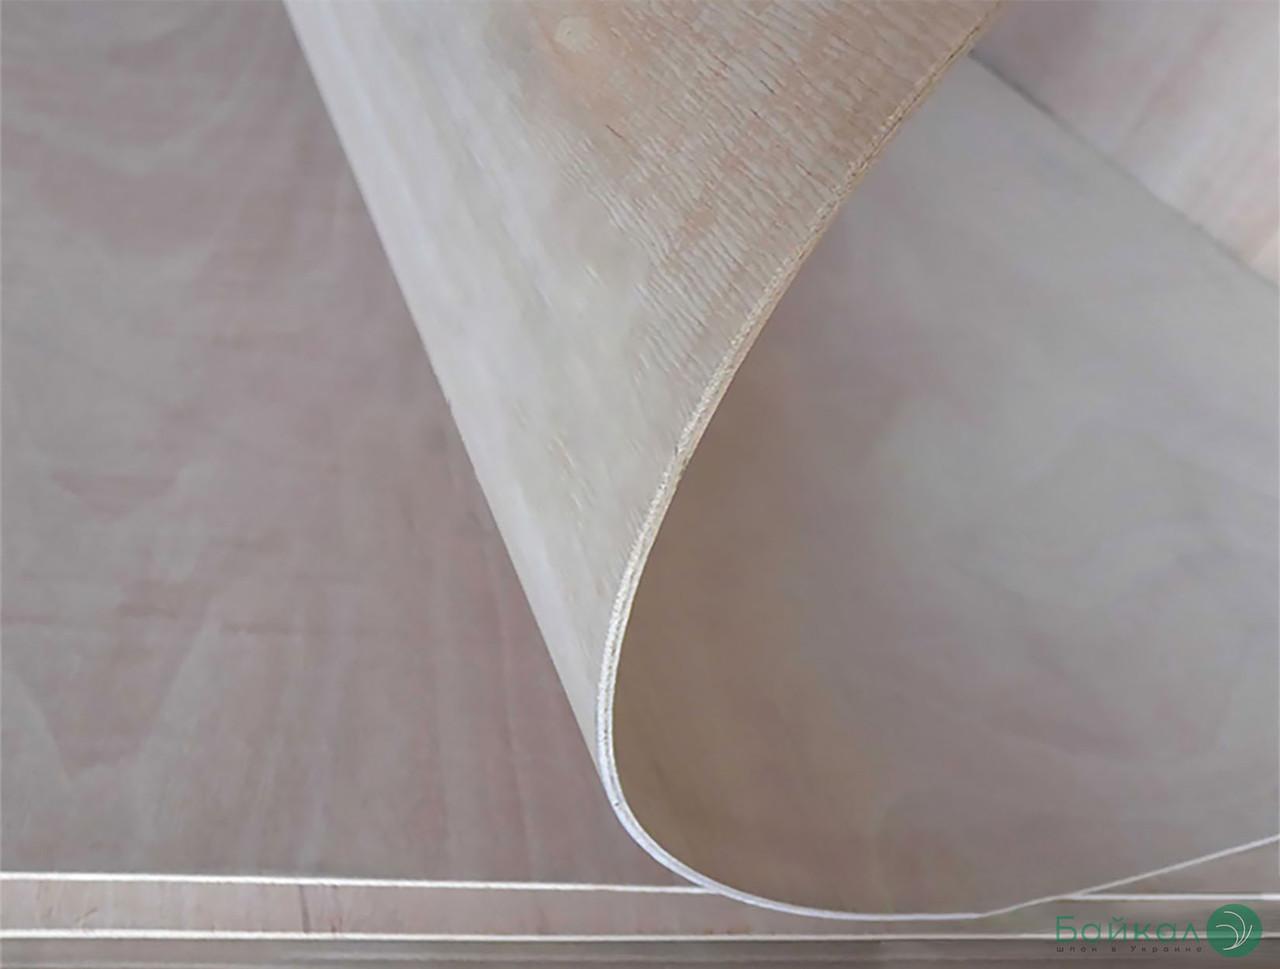 Фанера гнучка сейба 3 мм - 1,22х2,44 м (Поперечна / Cross)